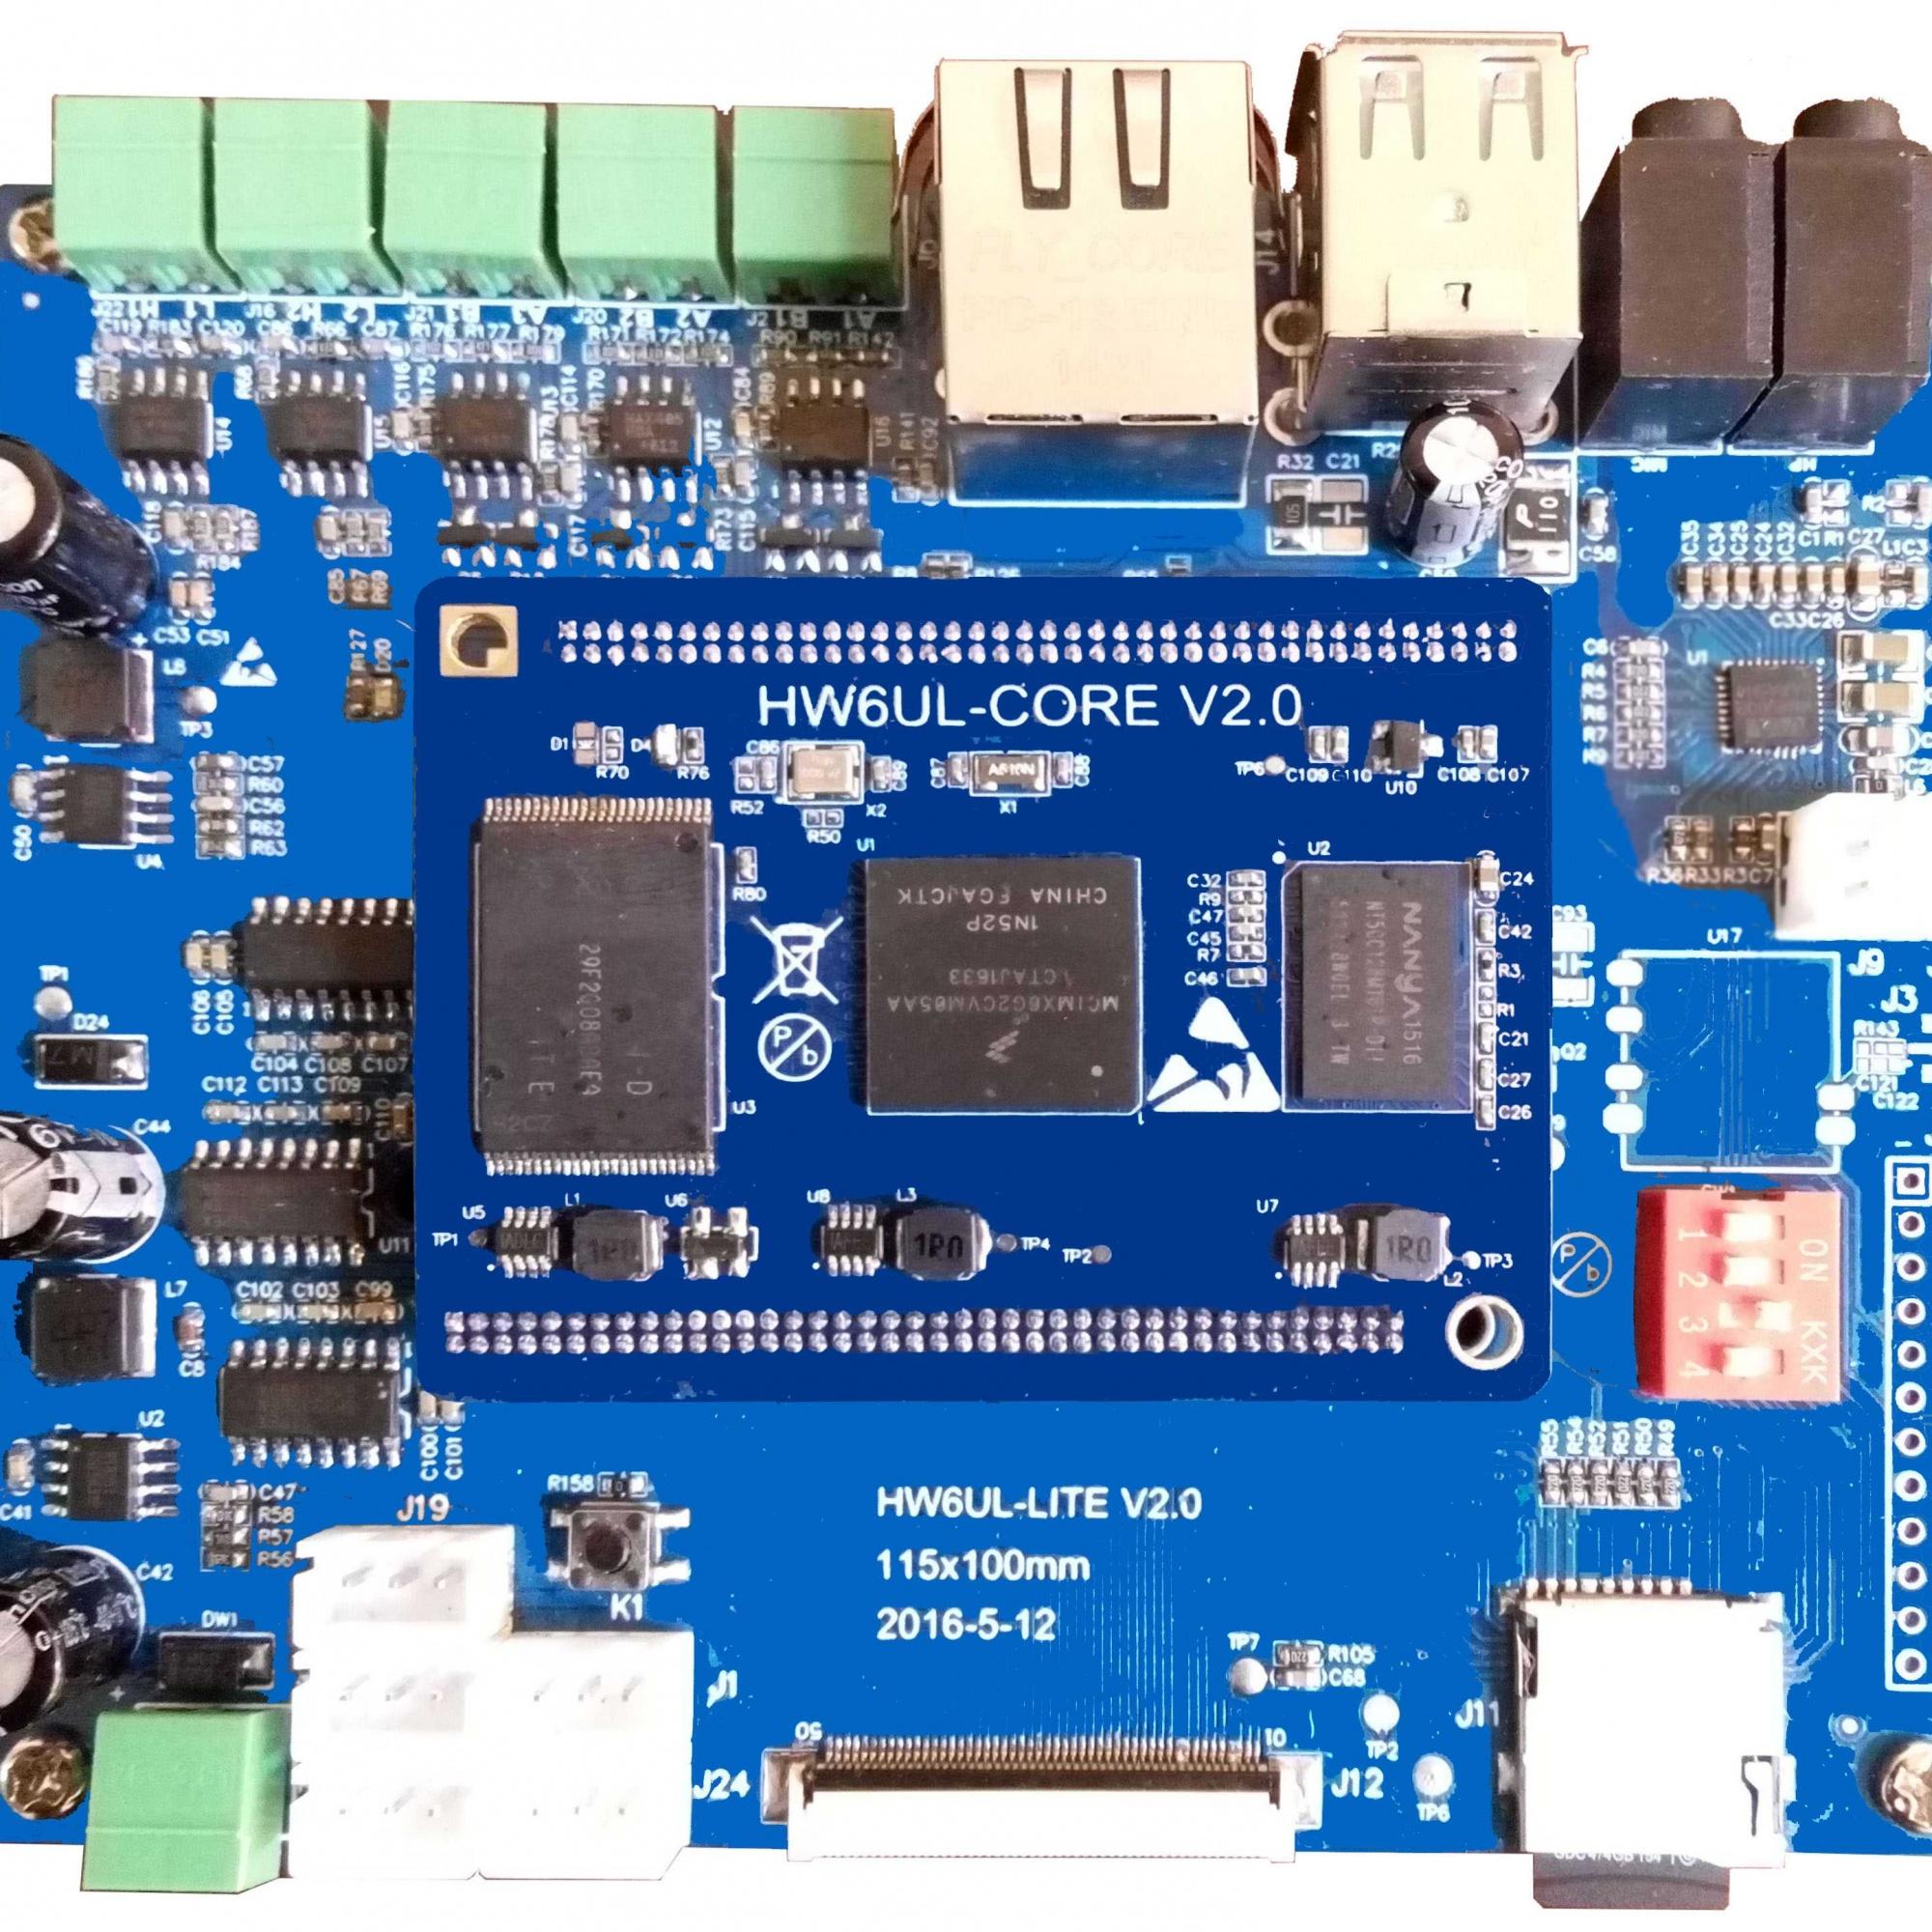 ARM工控板   AM335X开发板   IMX6UL工控板   多串口   千兆以太网  双网口